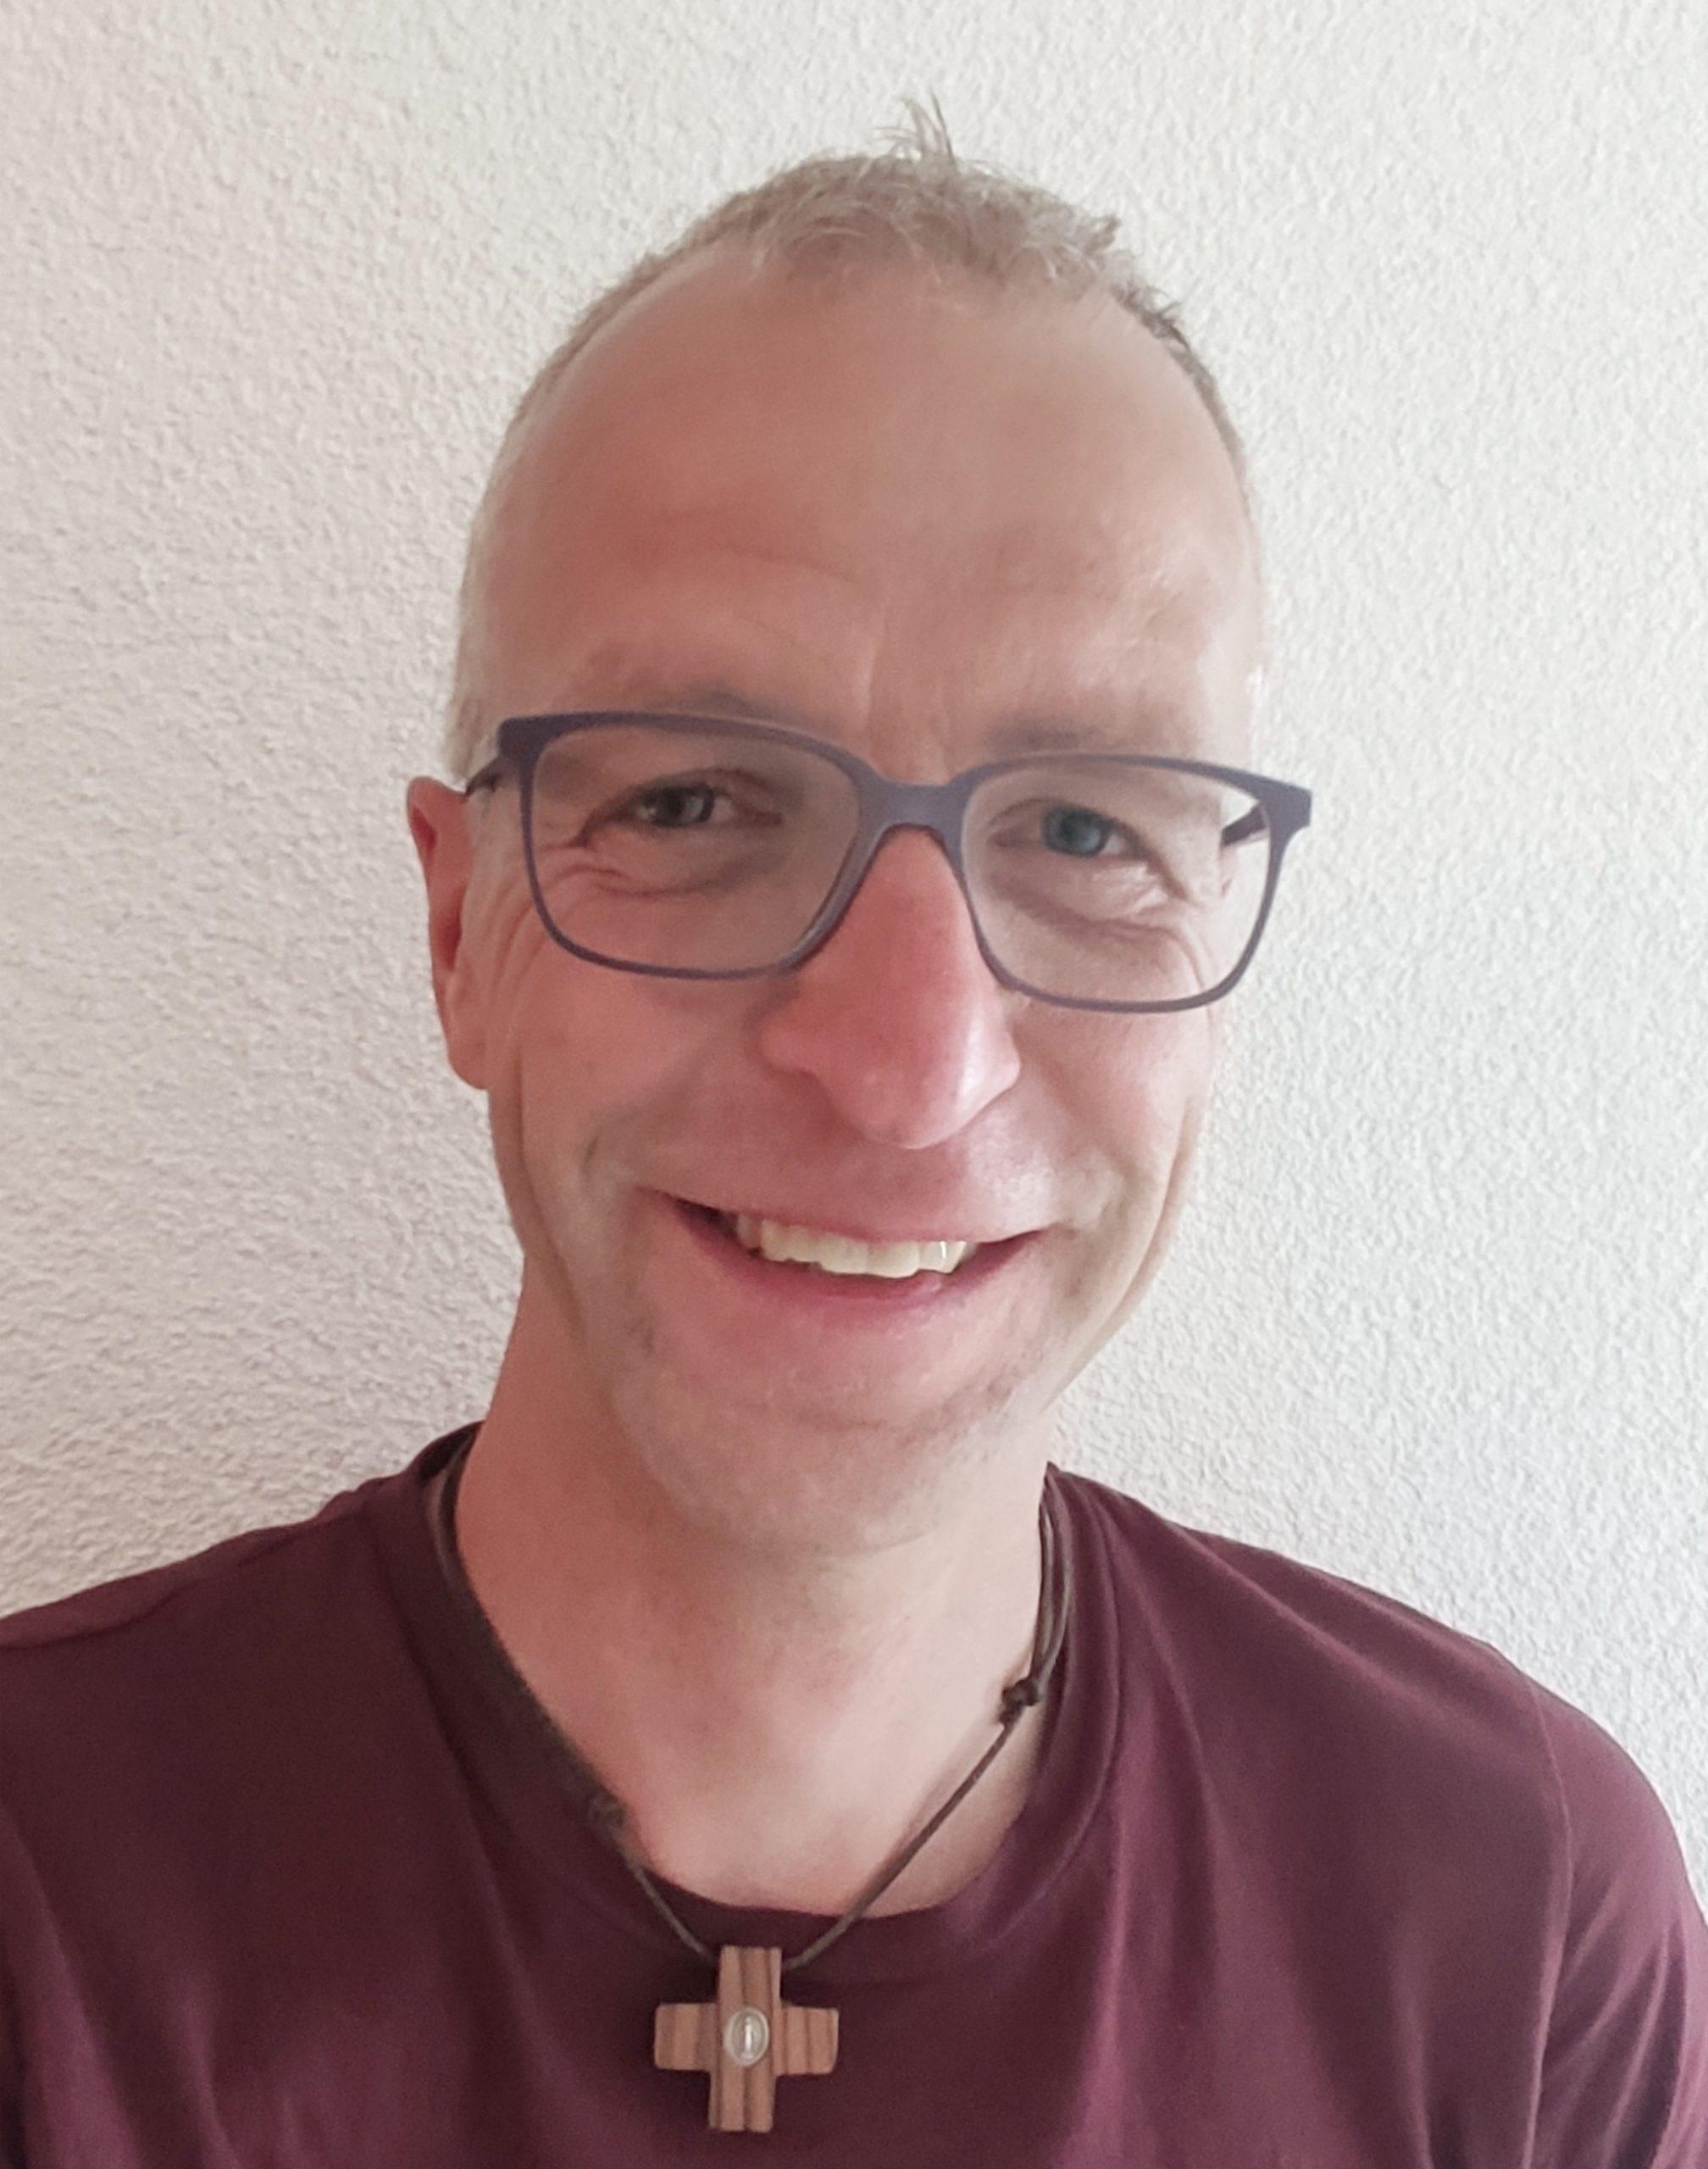 Christof Brunschwiler